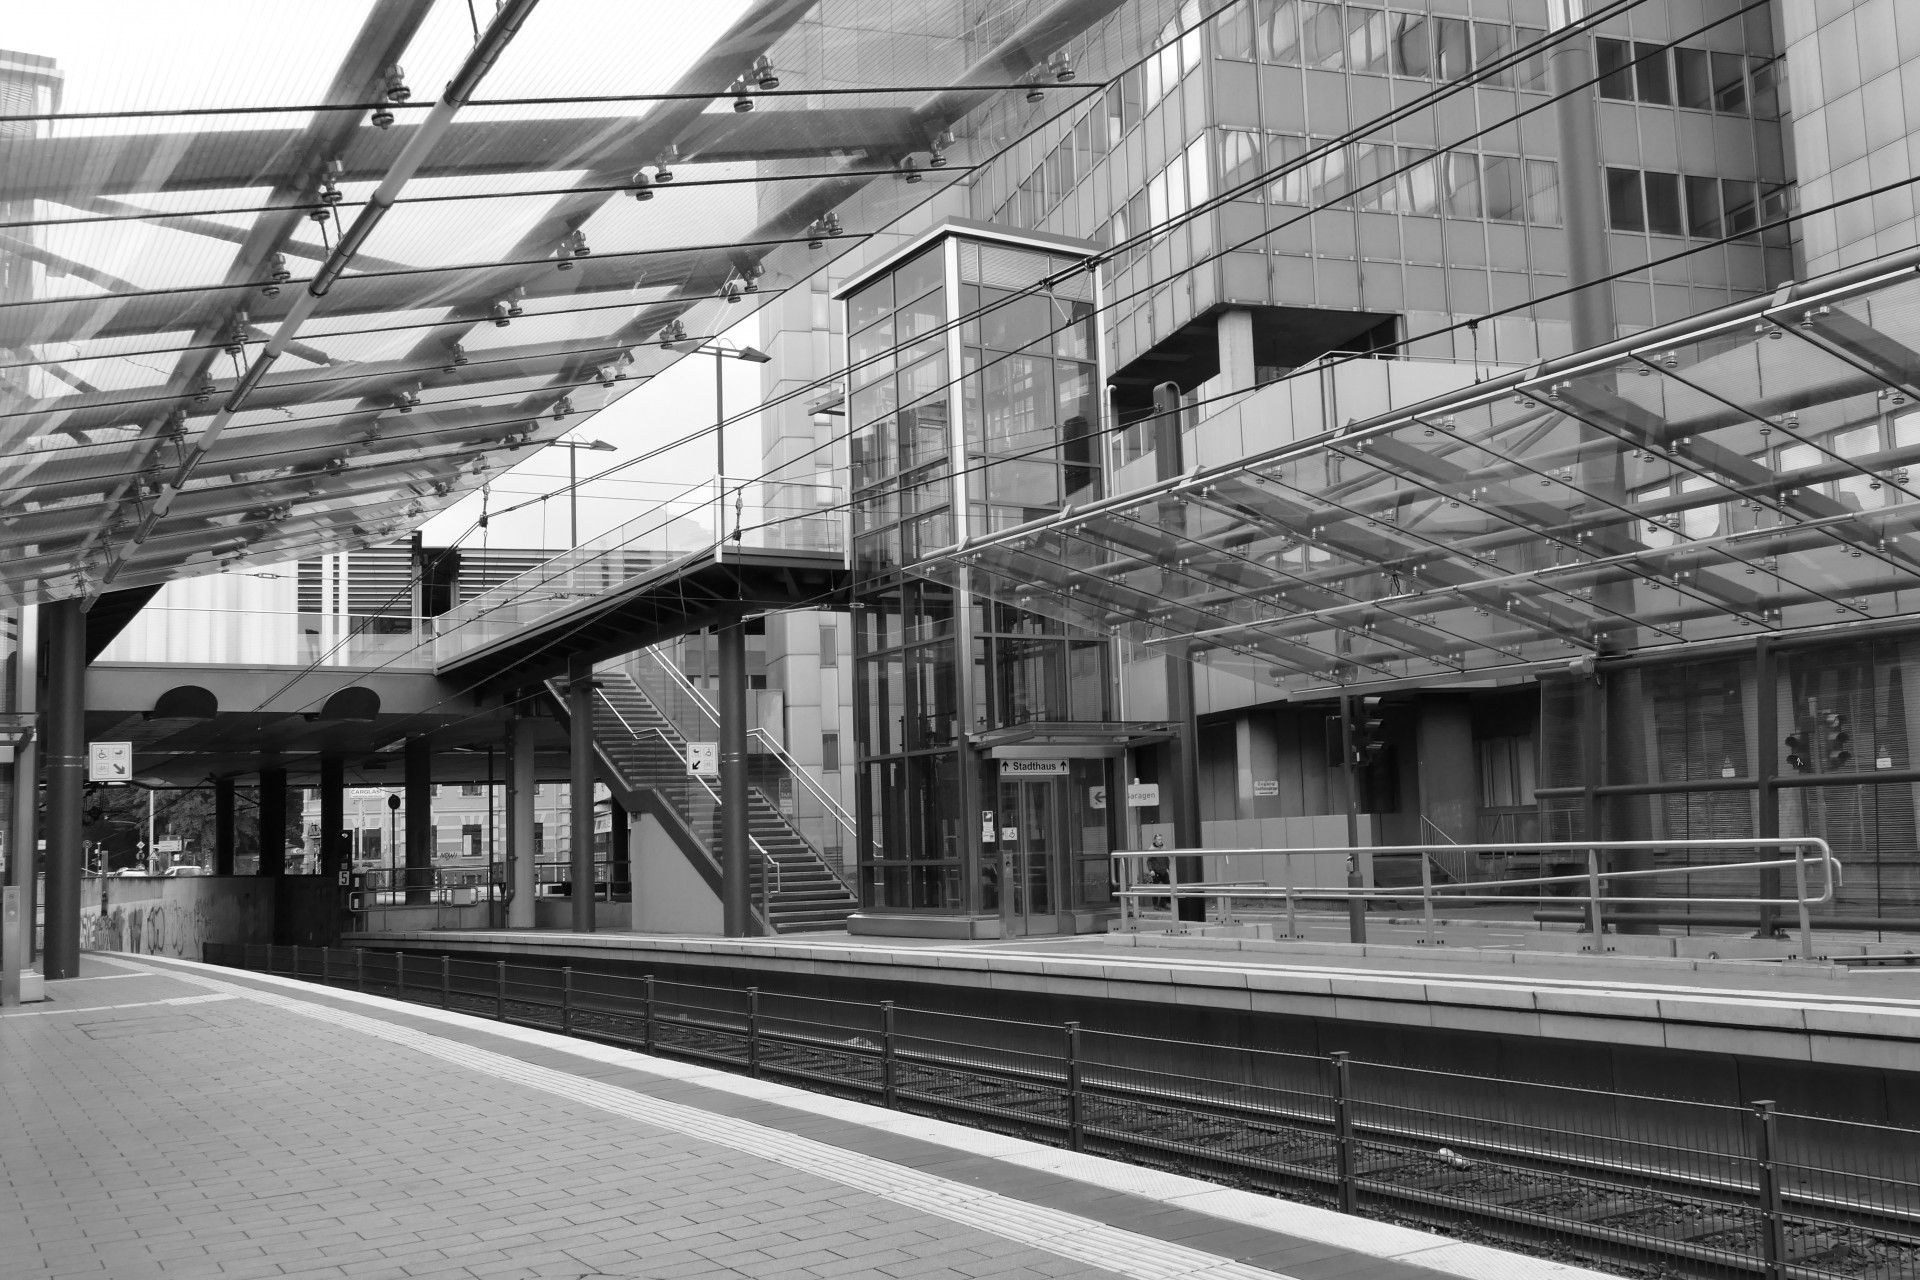 S-Bahn am Stadthaus f/3.8 1/500sec ISO-400 12.12mm